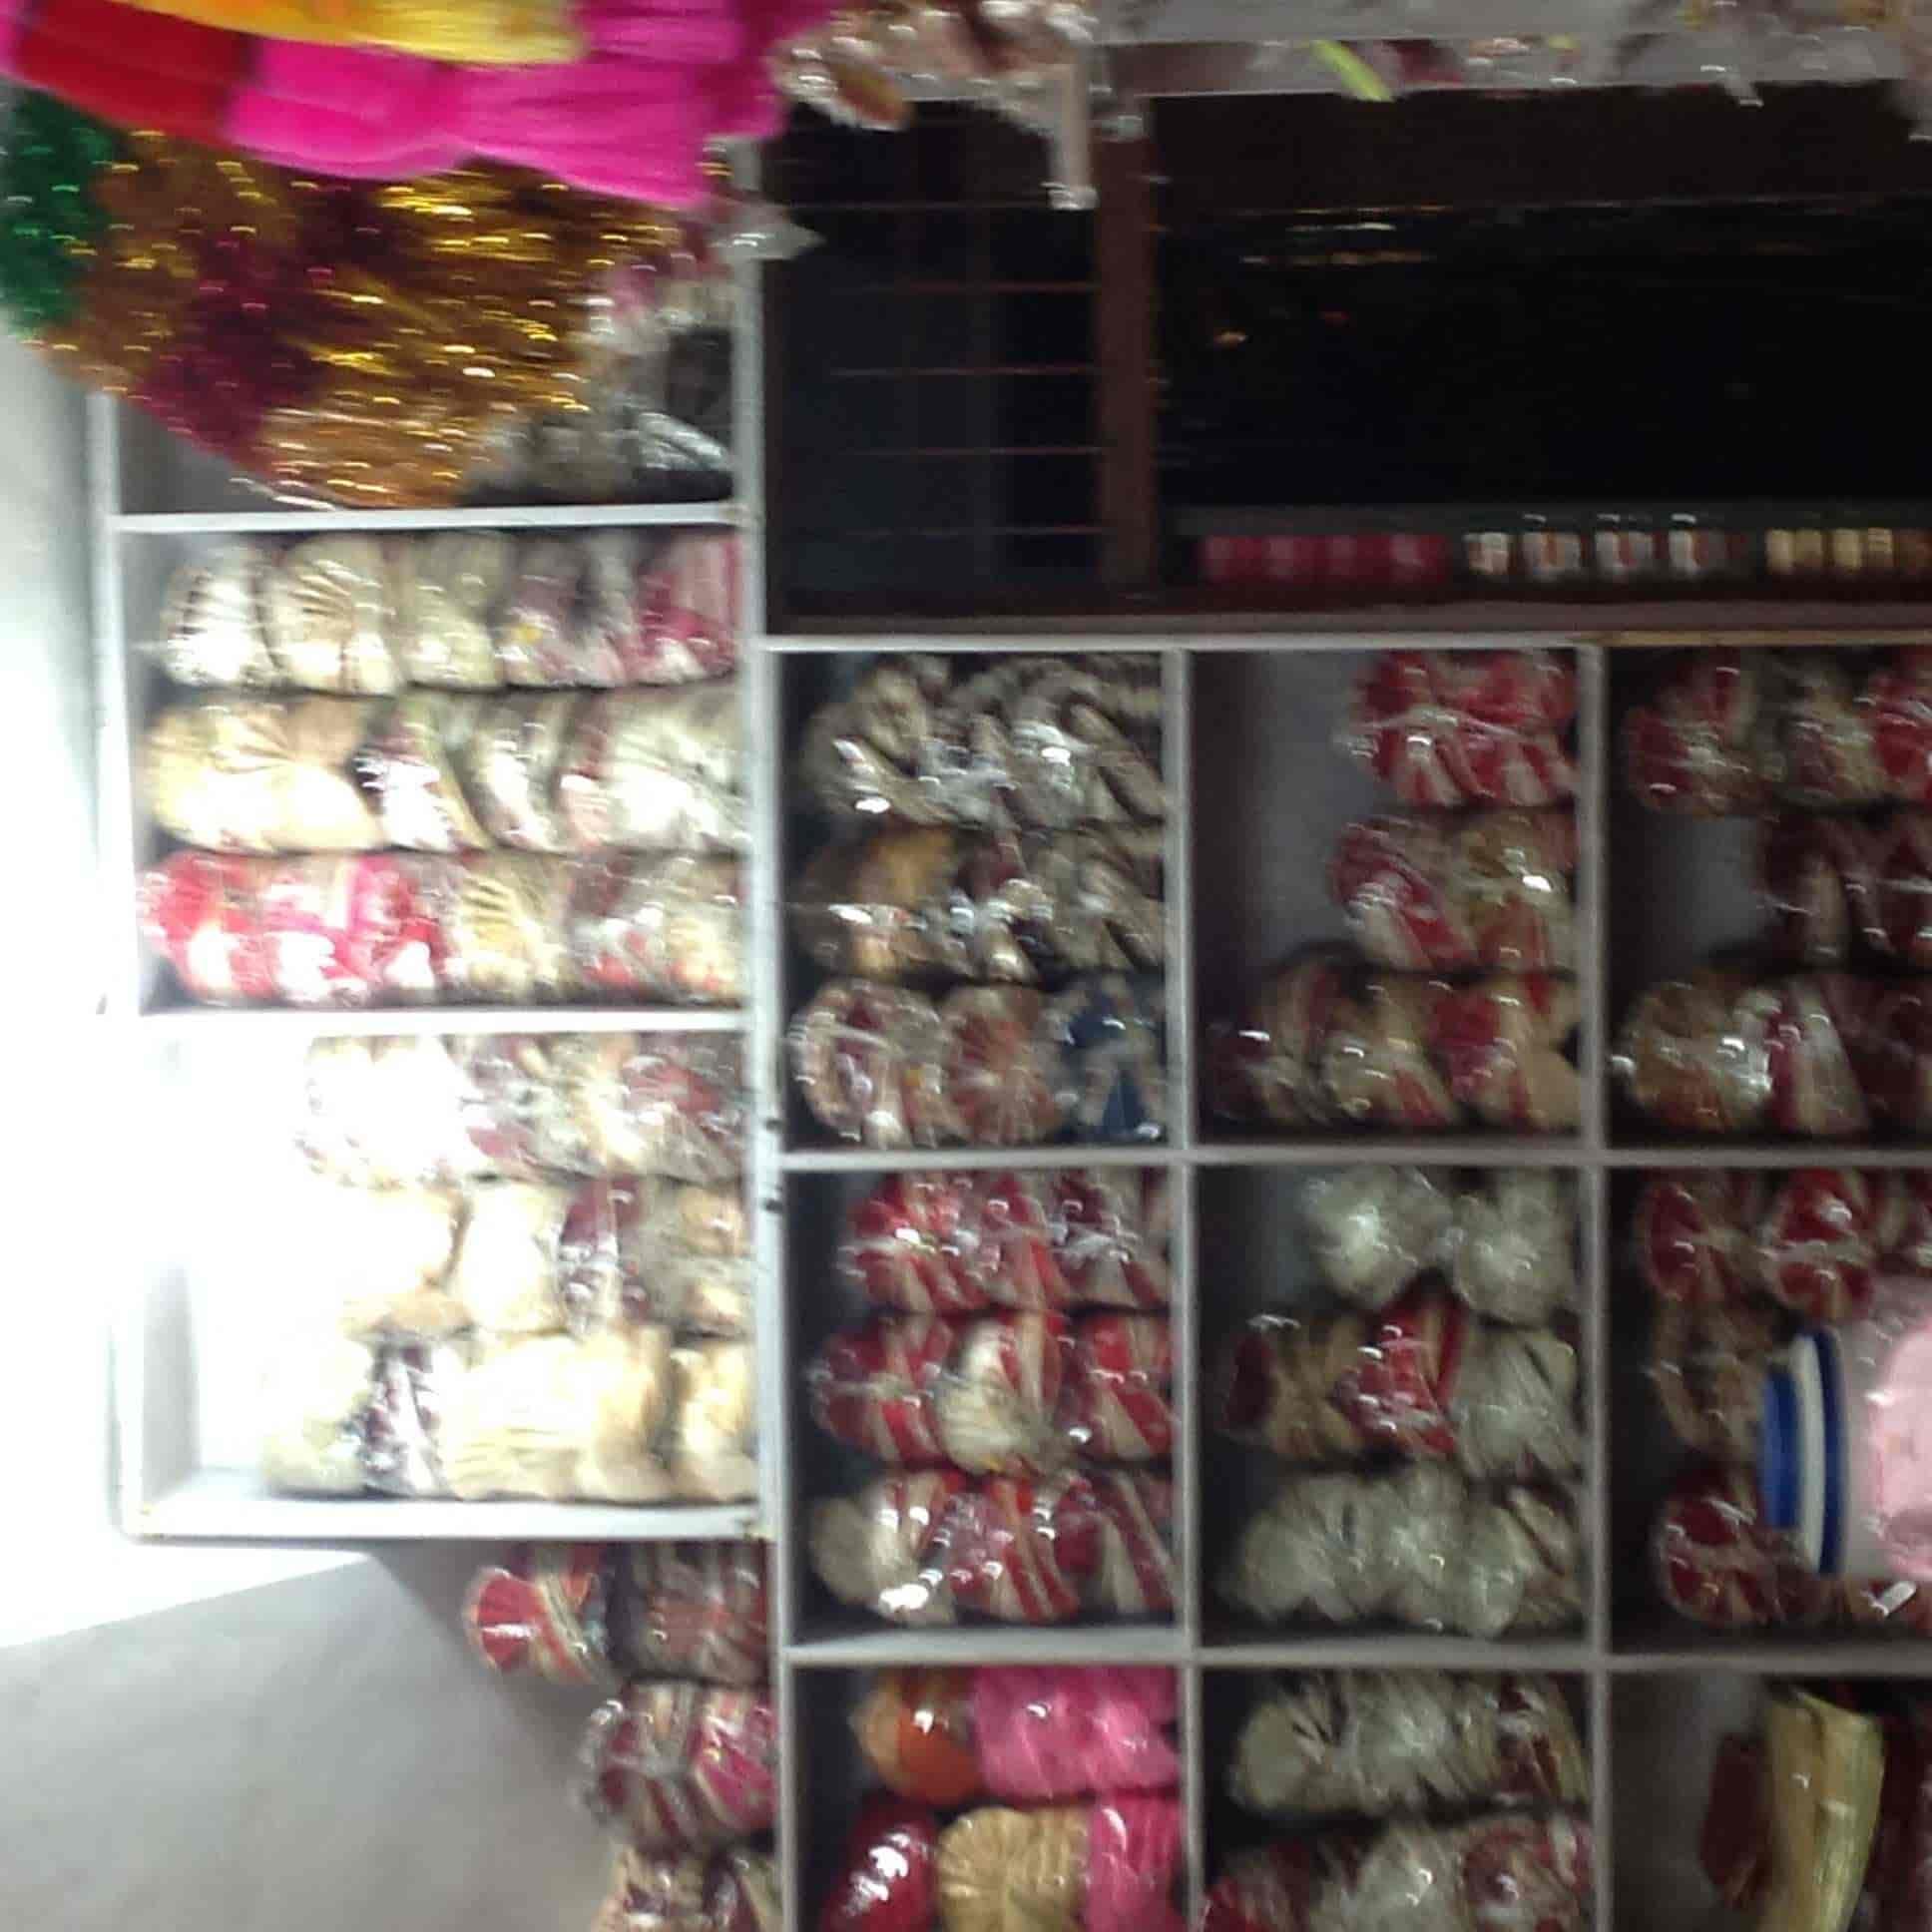 Hare krishna agencies photos chandigarh sector 45c chandigarh hare krishna agencies photos chandigarh sector 45c chandigarh wedding decoration material dealers junglespirit Choice Image